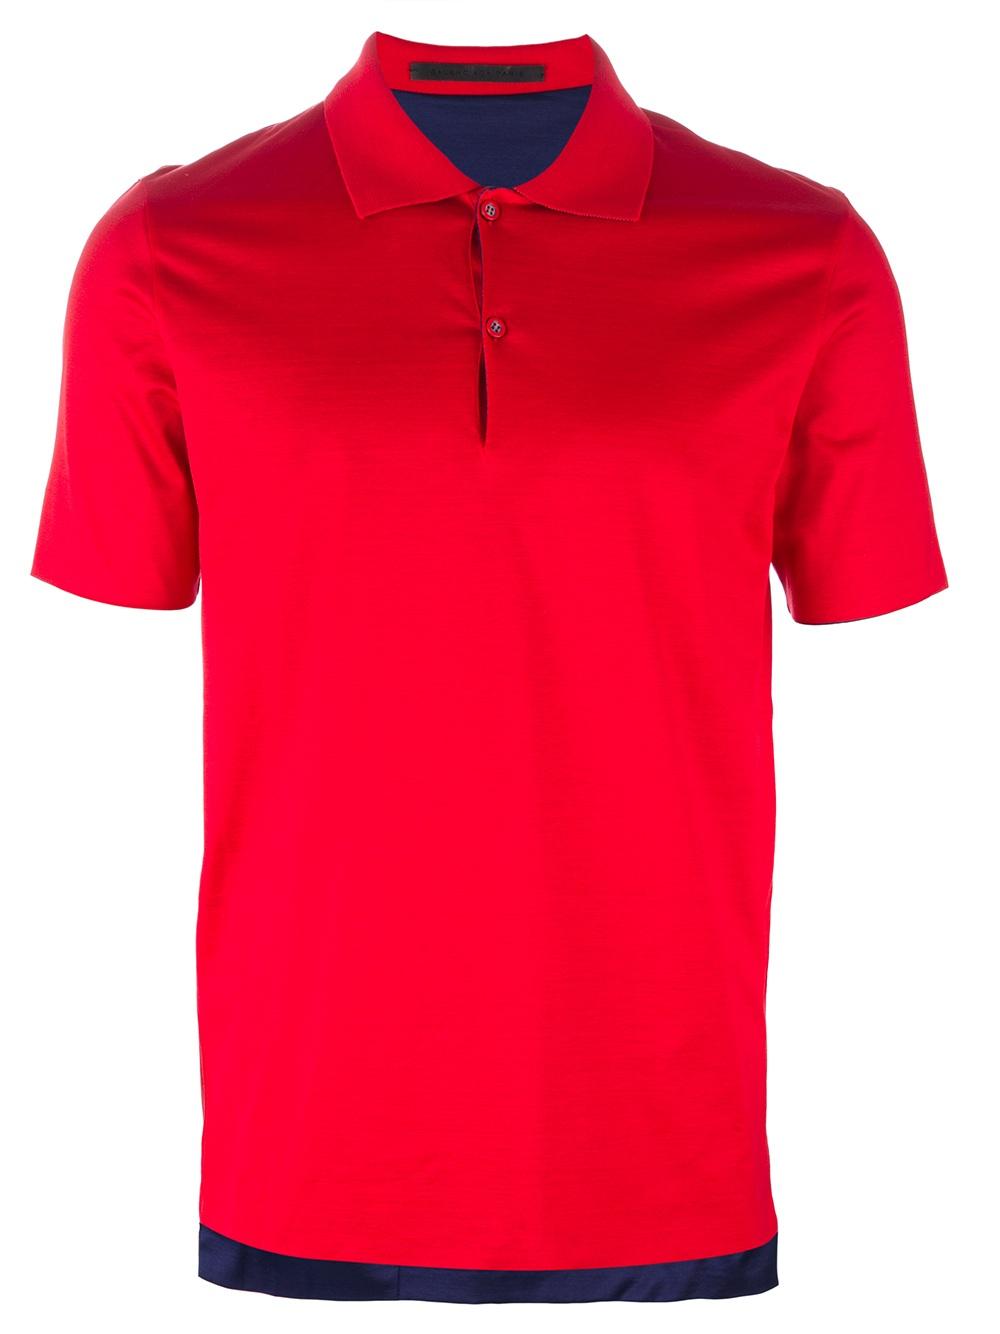 Balenciaga Reversible Polo Shirt In Red For Men Lyst